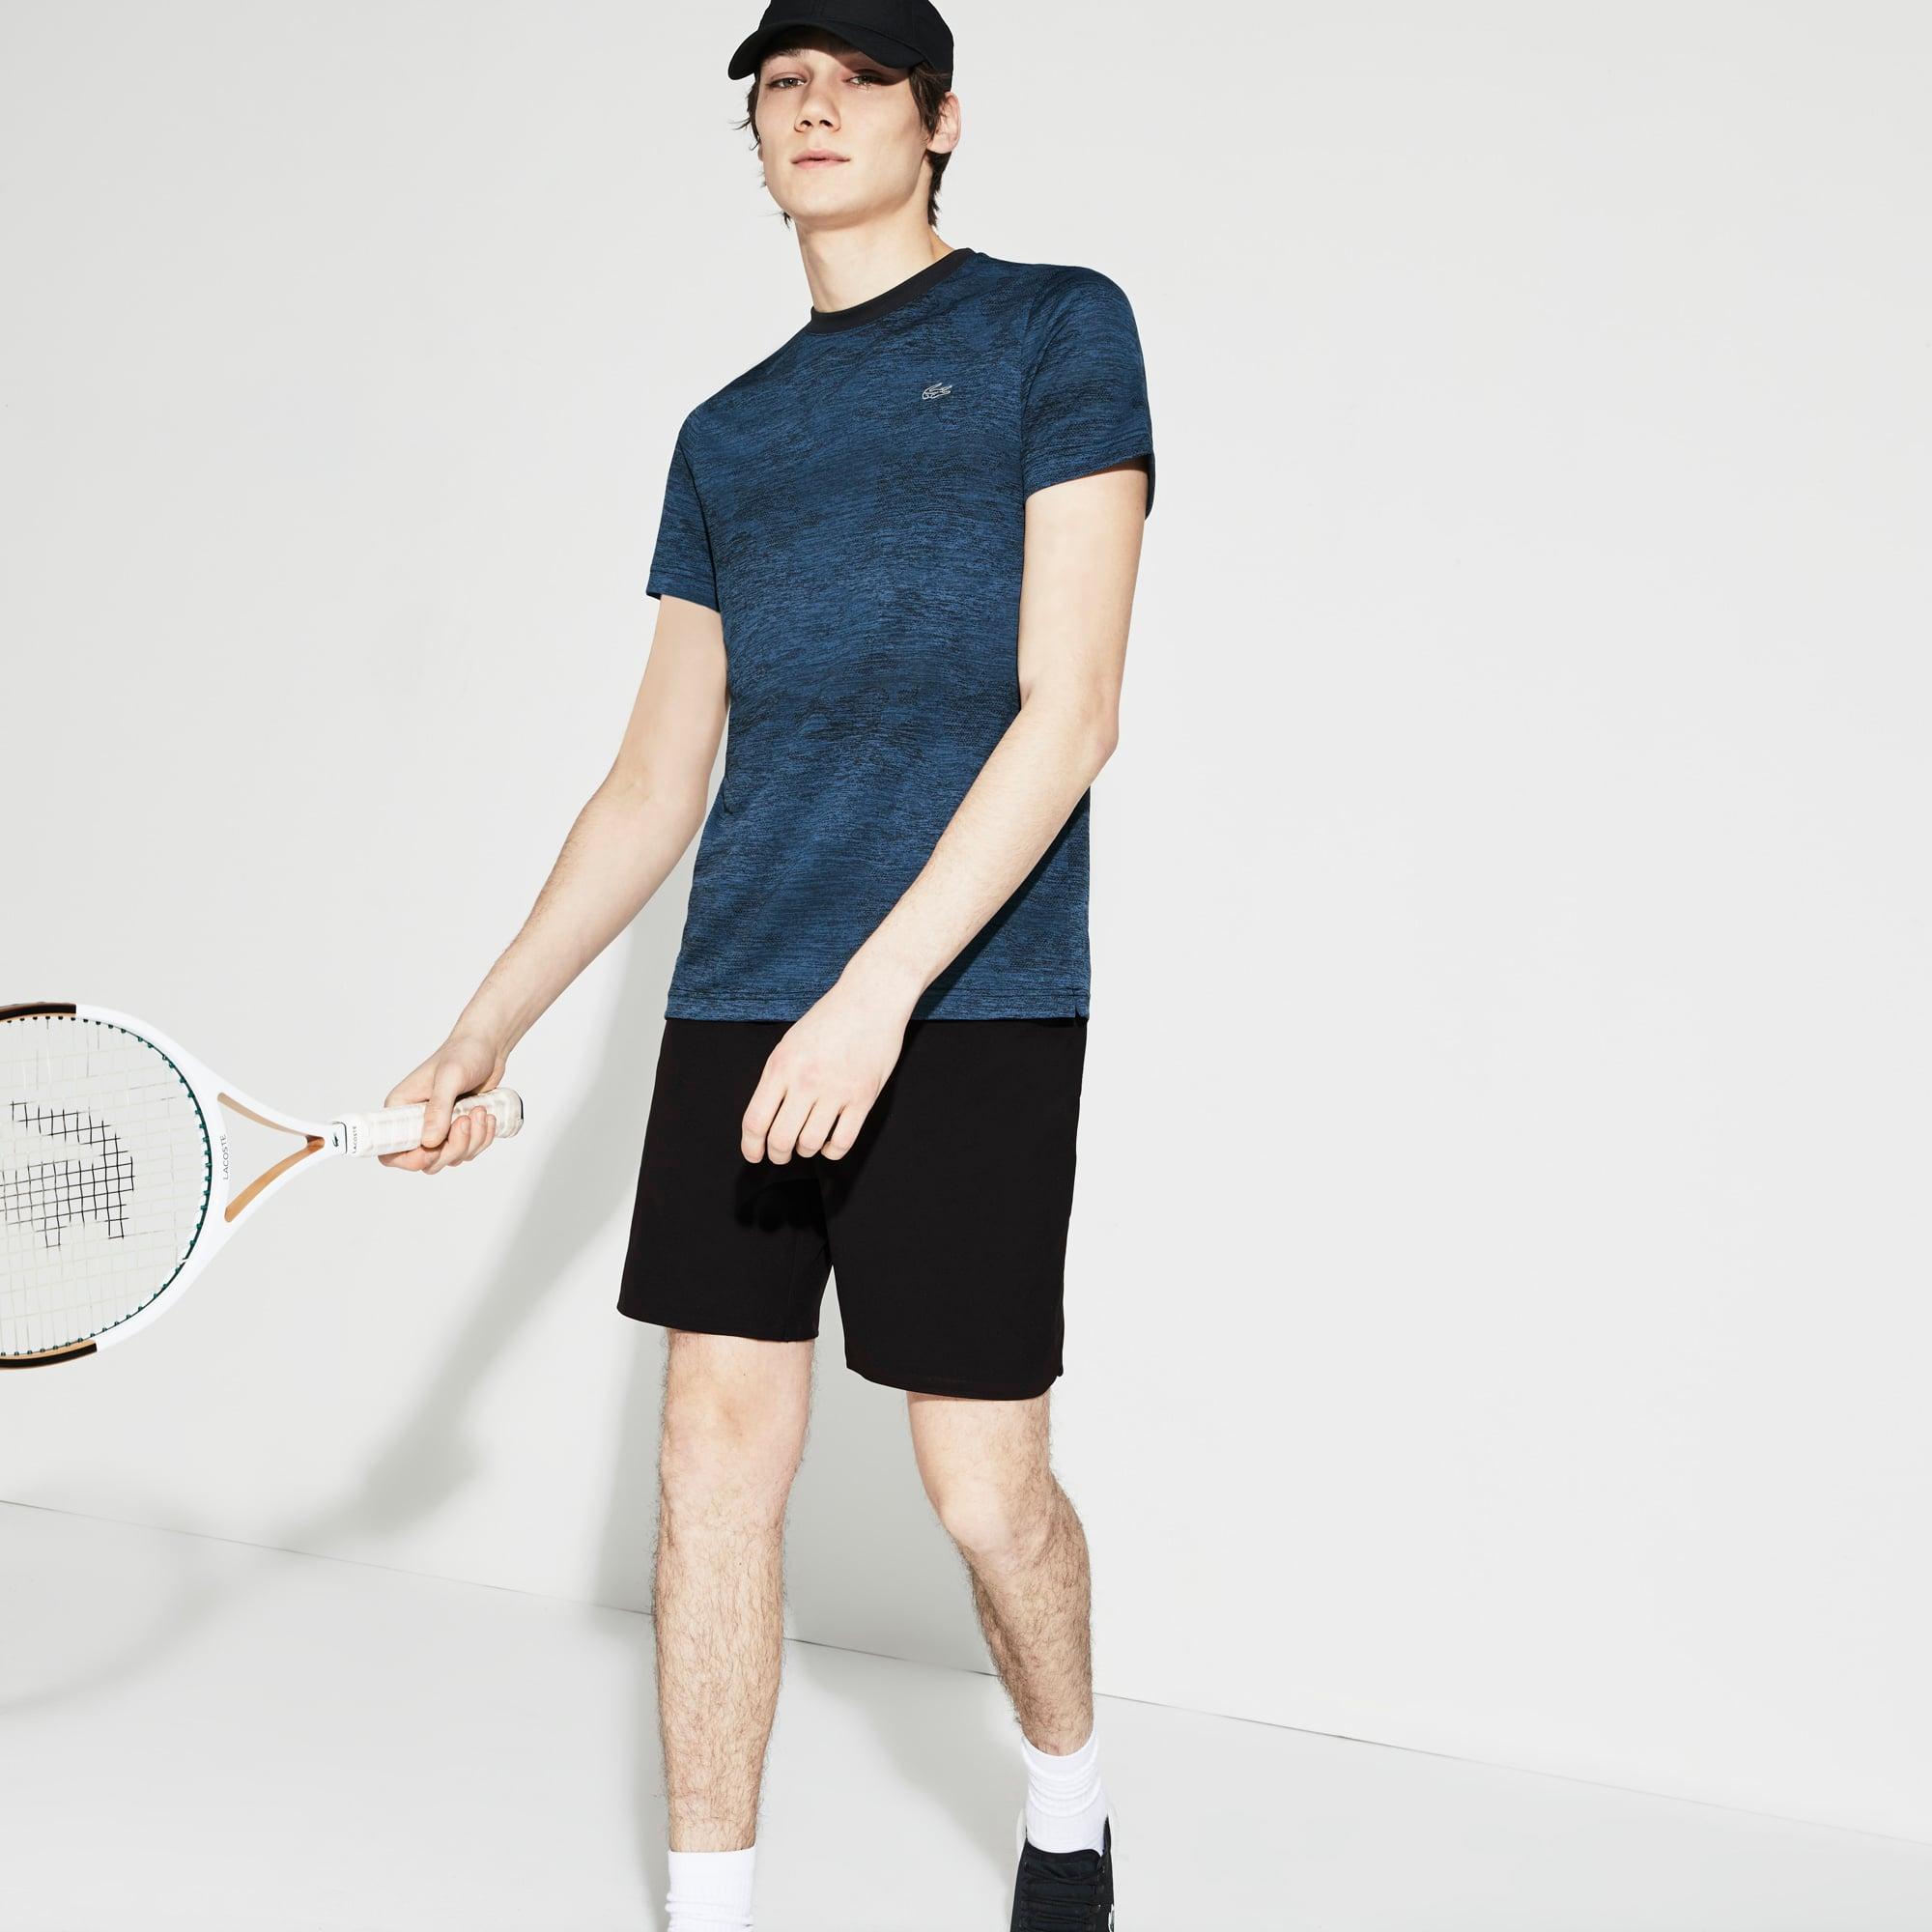 Pantaloncini tecnici Tennis Lacoste SPORT tinta unita